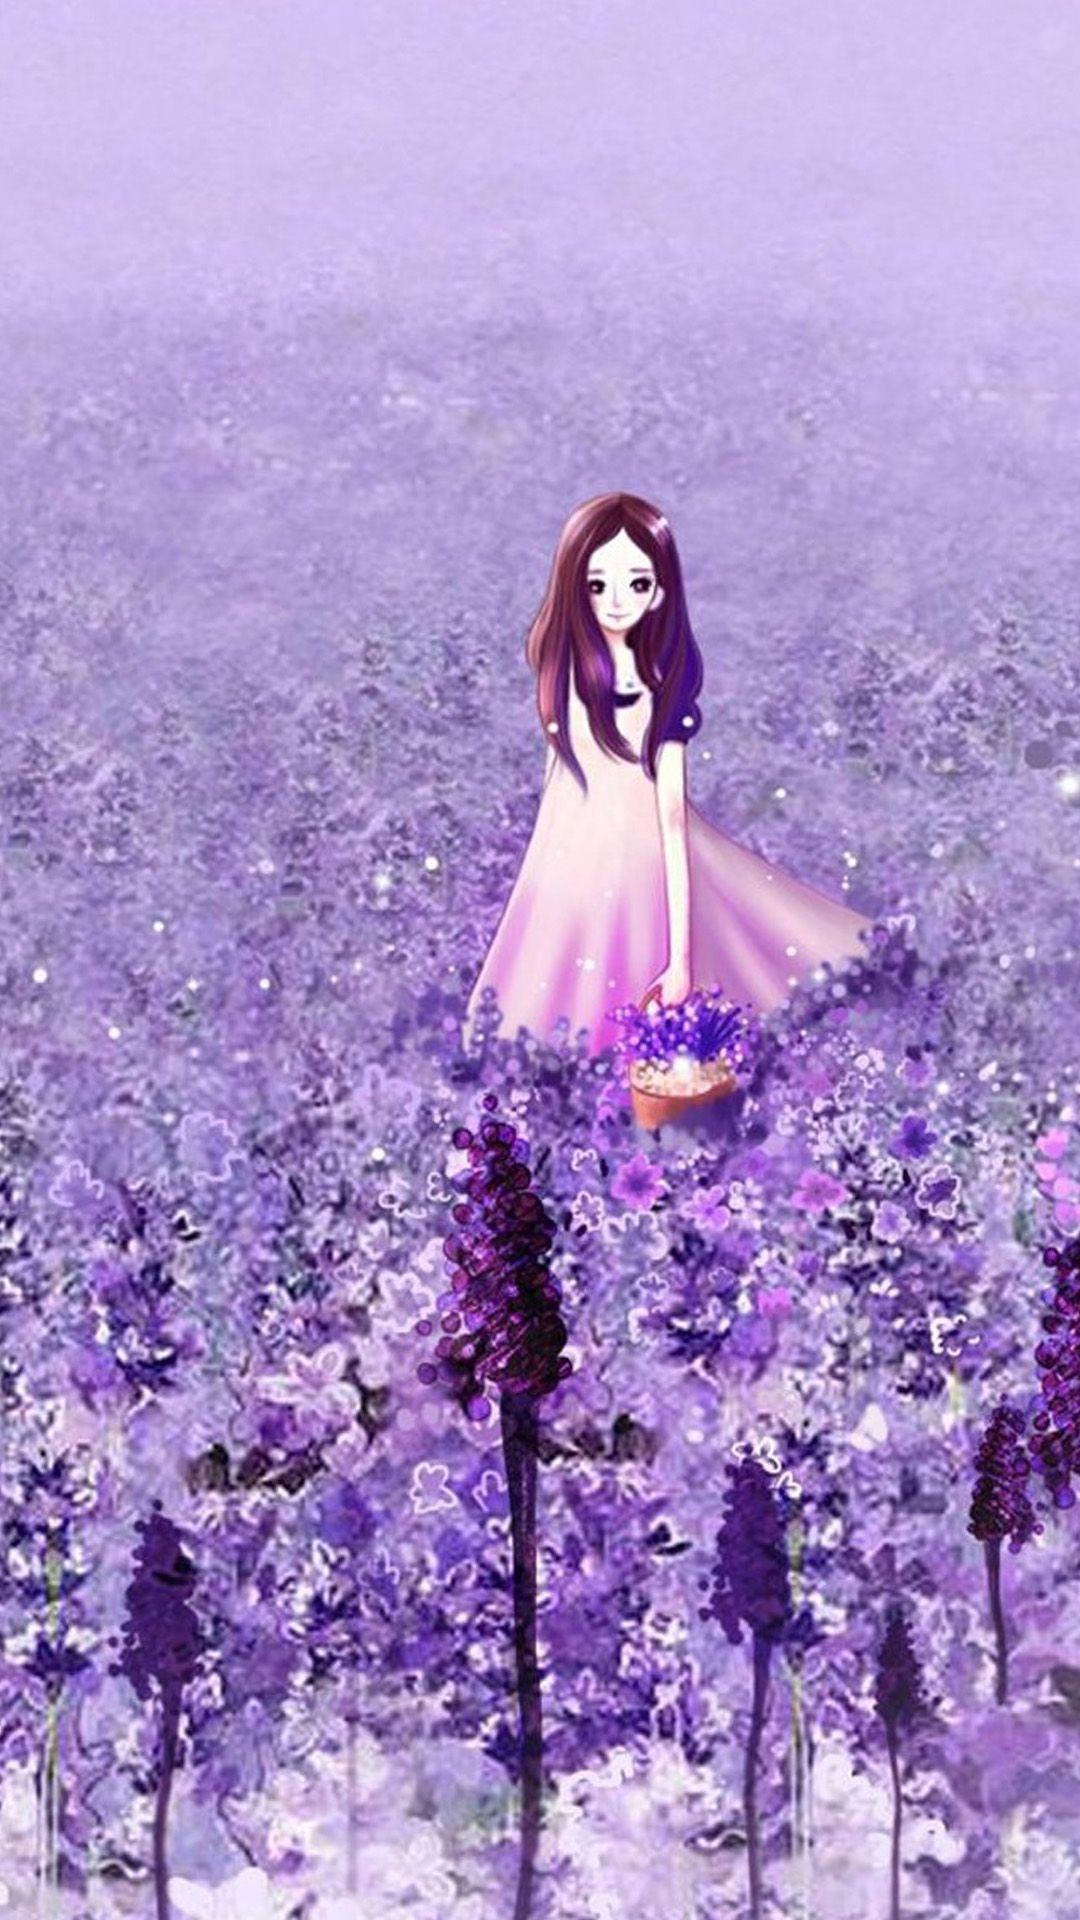 Flower Girl Otaku Anime Art Illust Spring iPhone 6